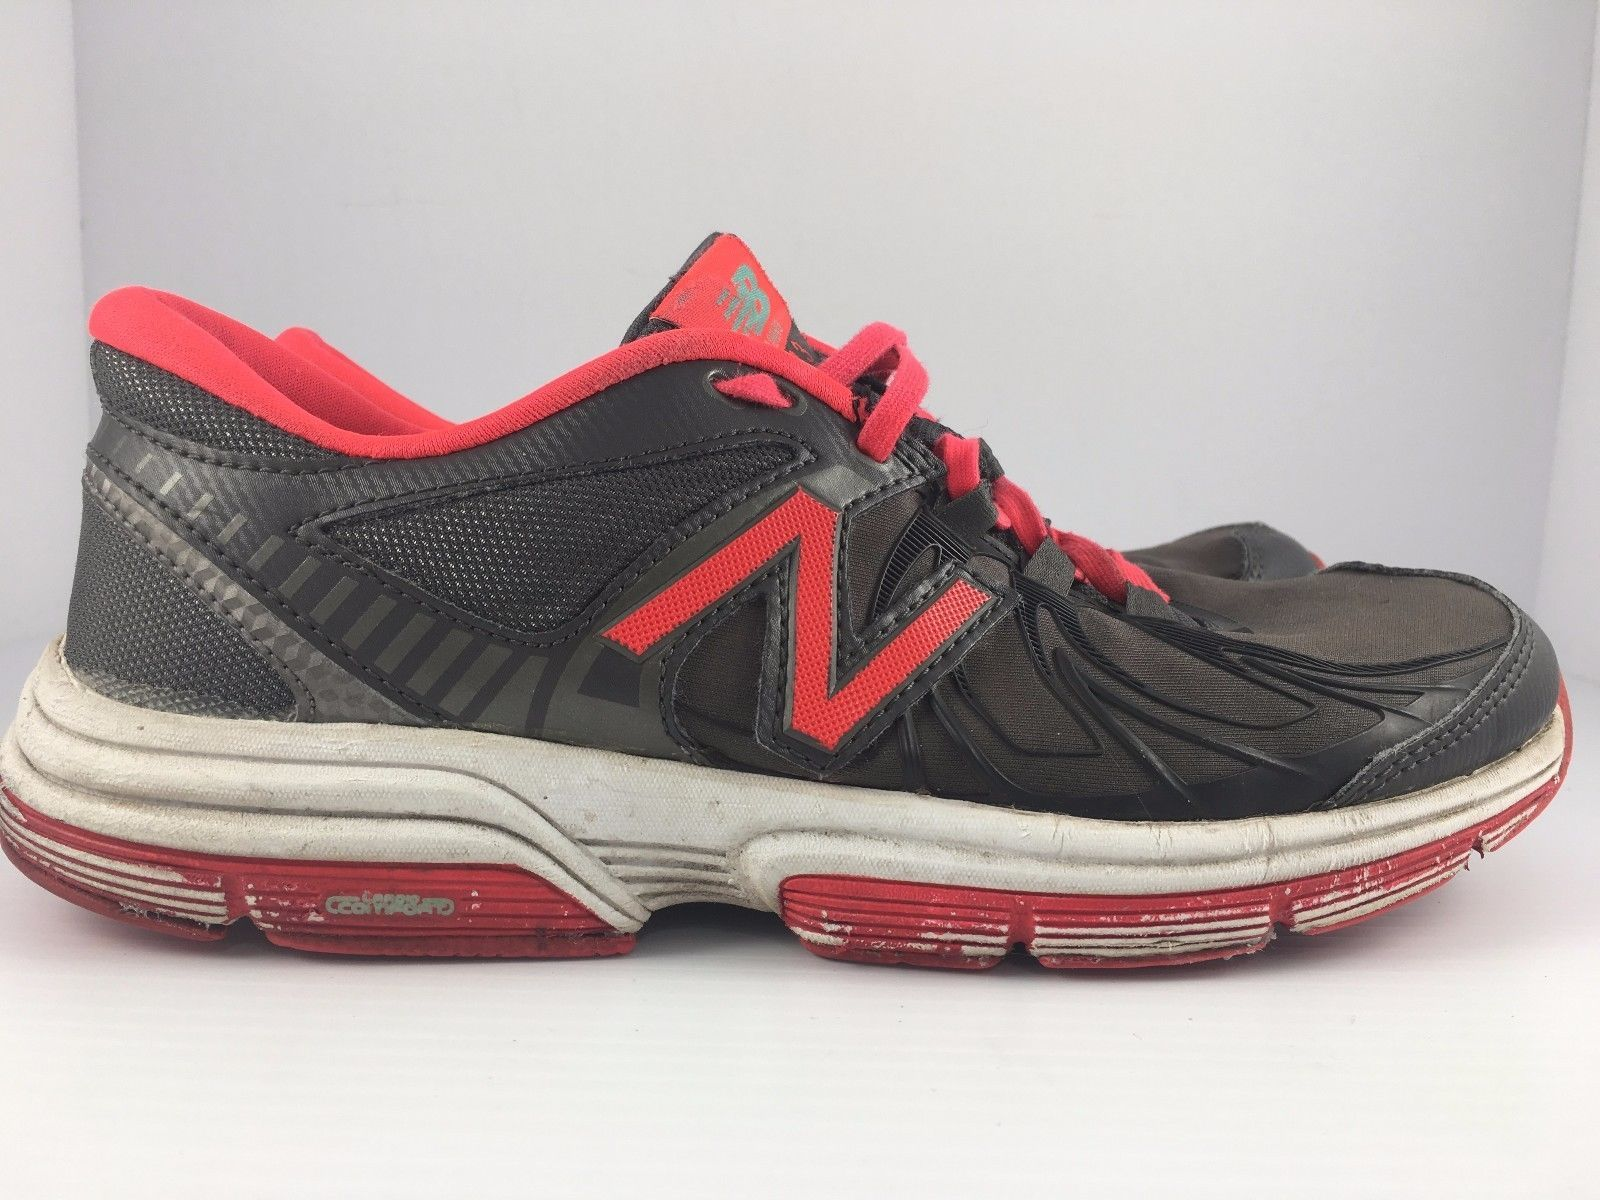 New Balance 813 Shoes Women's Size 7 B Gray WX813 Sneakers